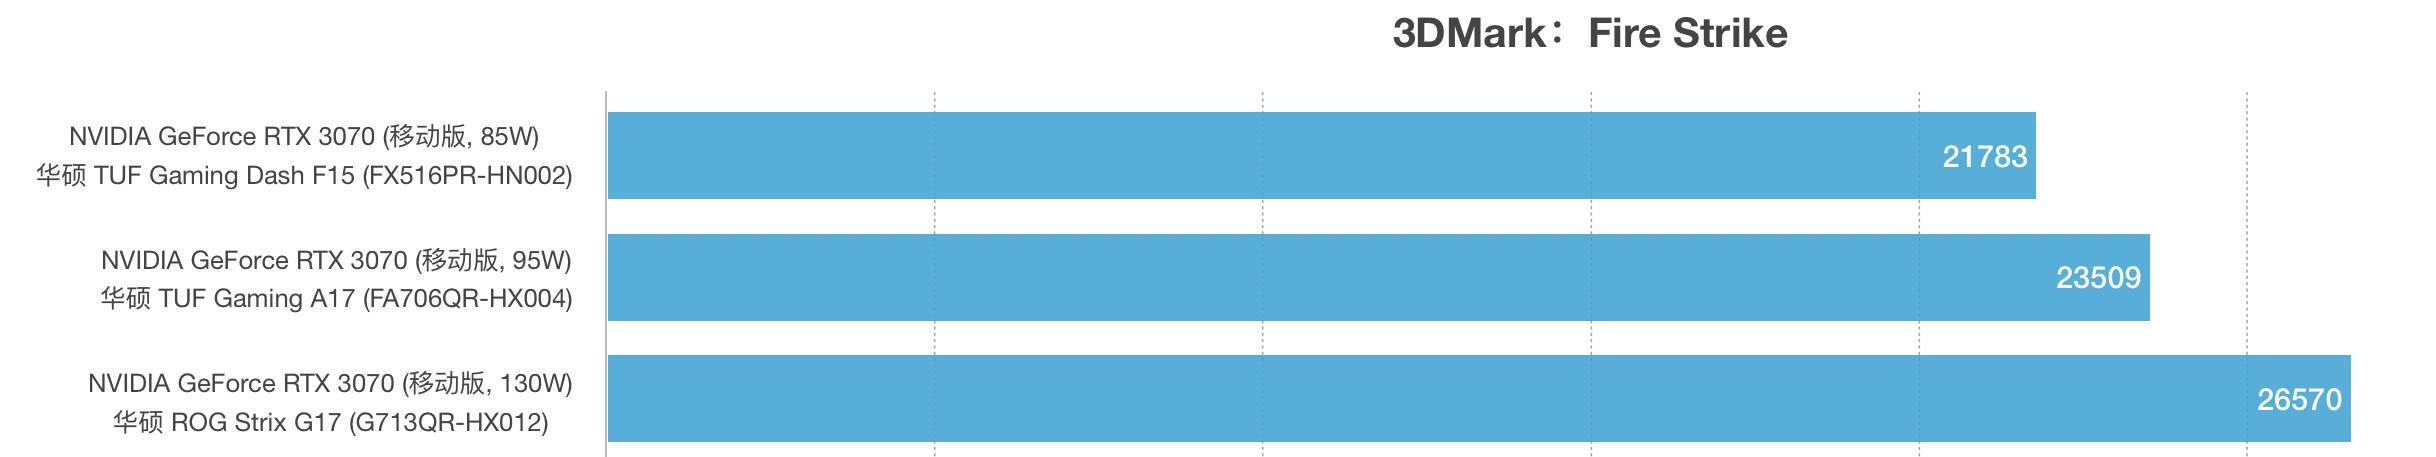 RTX 3070 85W,95W和130W性能跑分对比评测